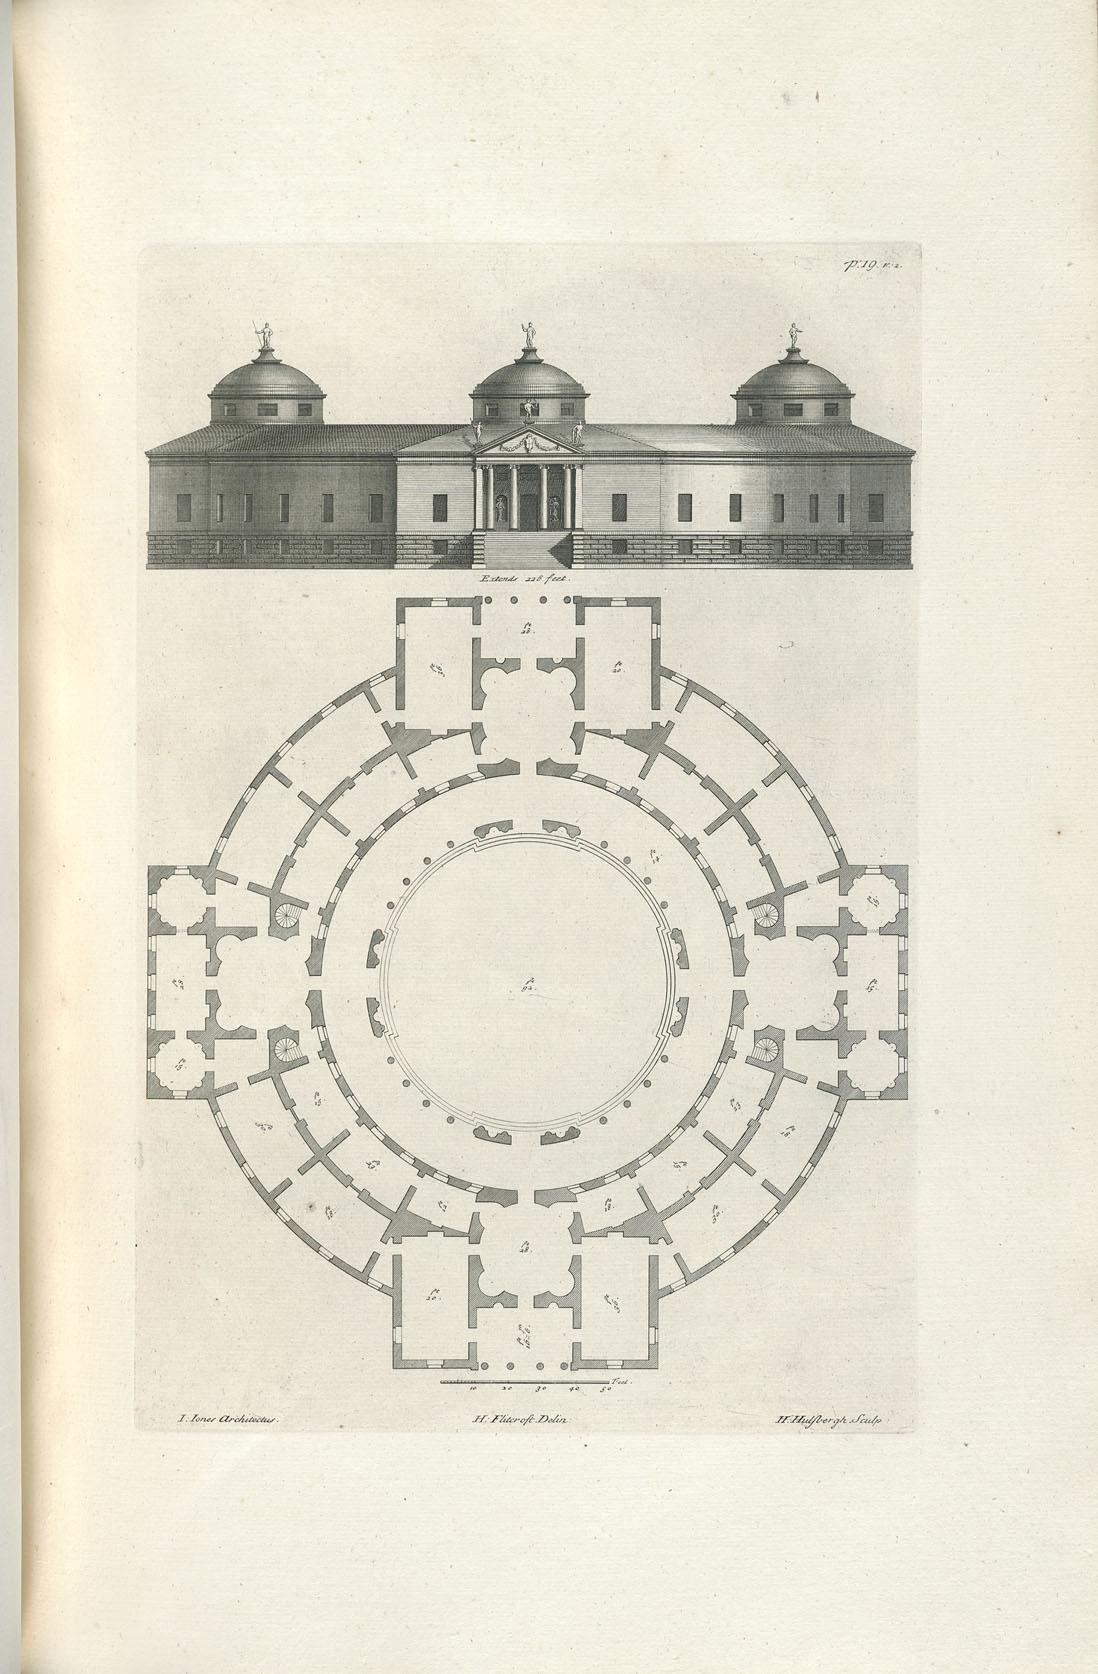 Elevation For Circular Plan : Decorative arts the designs of inigo jones consisting